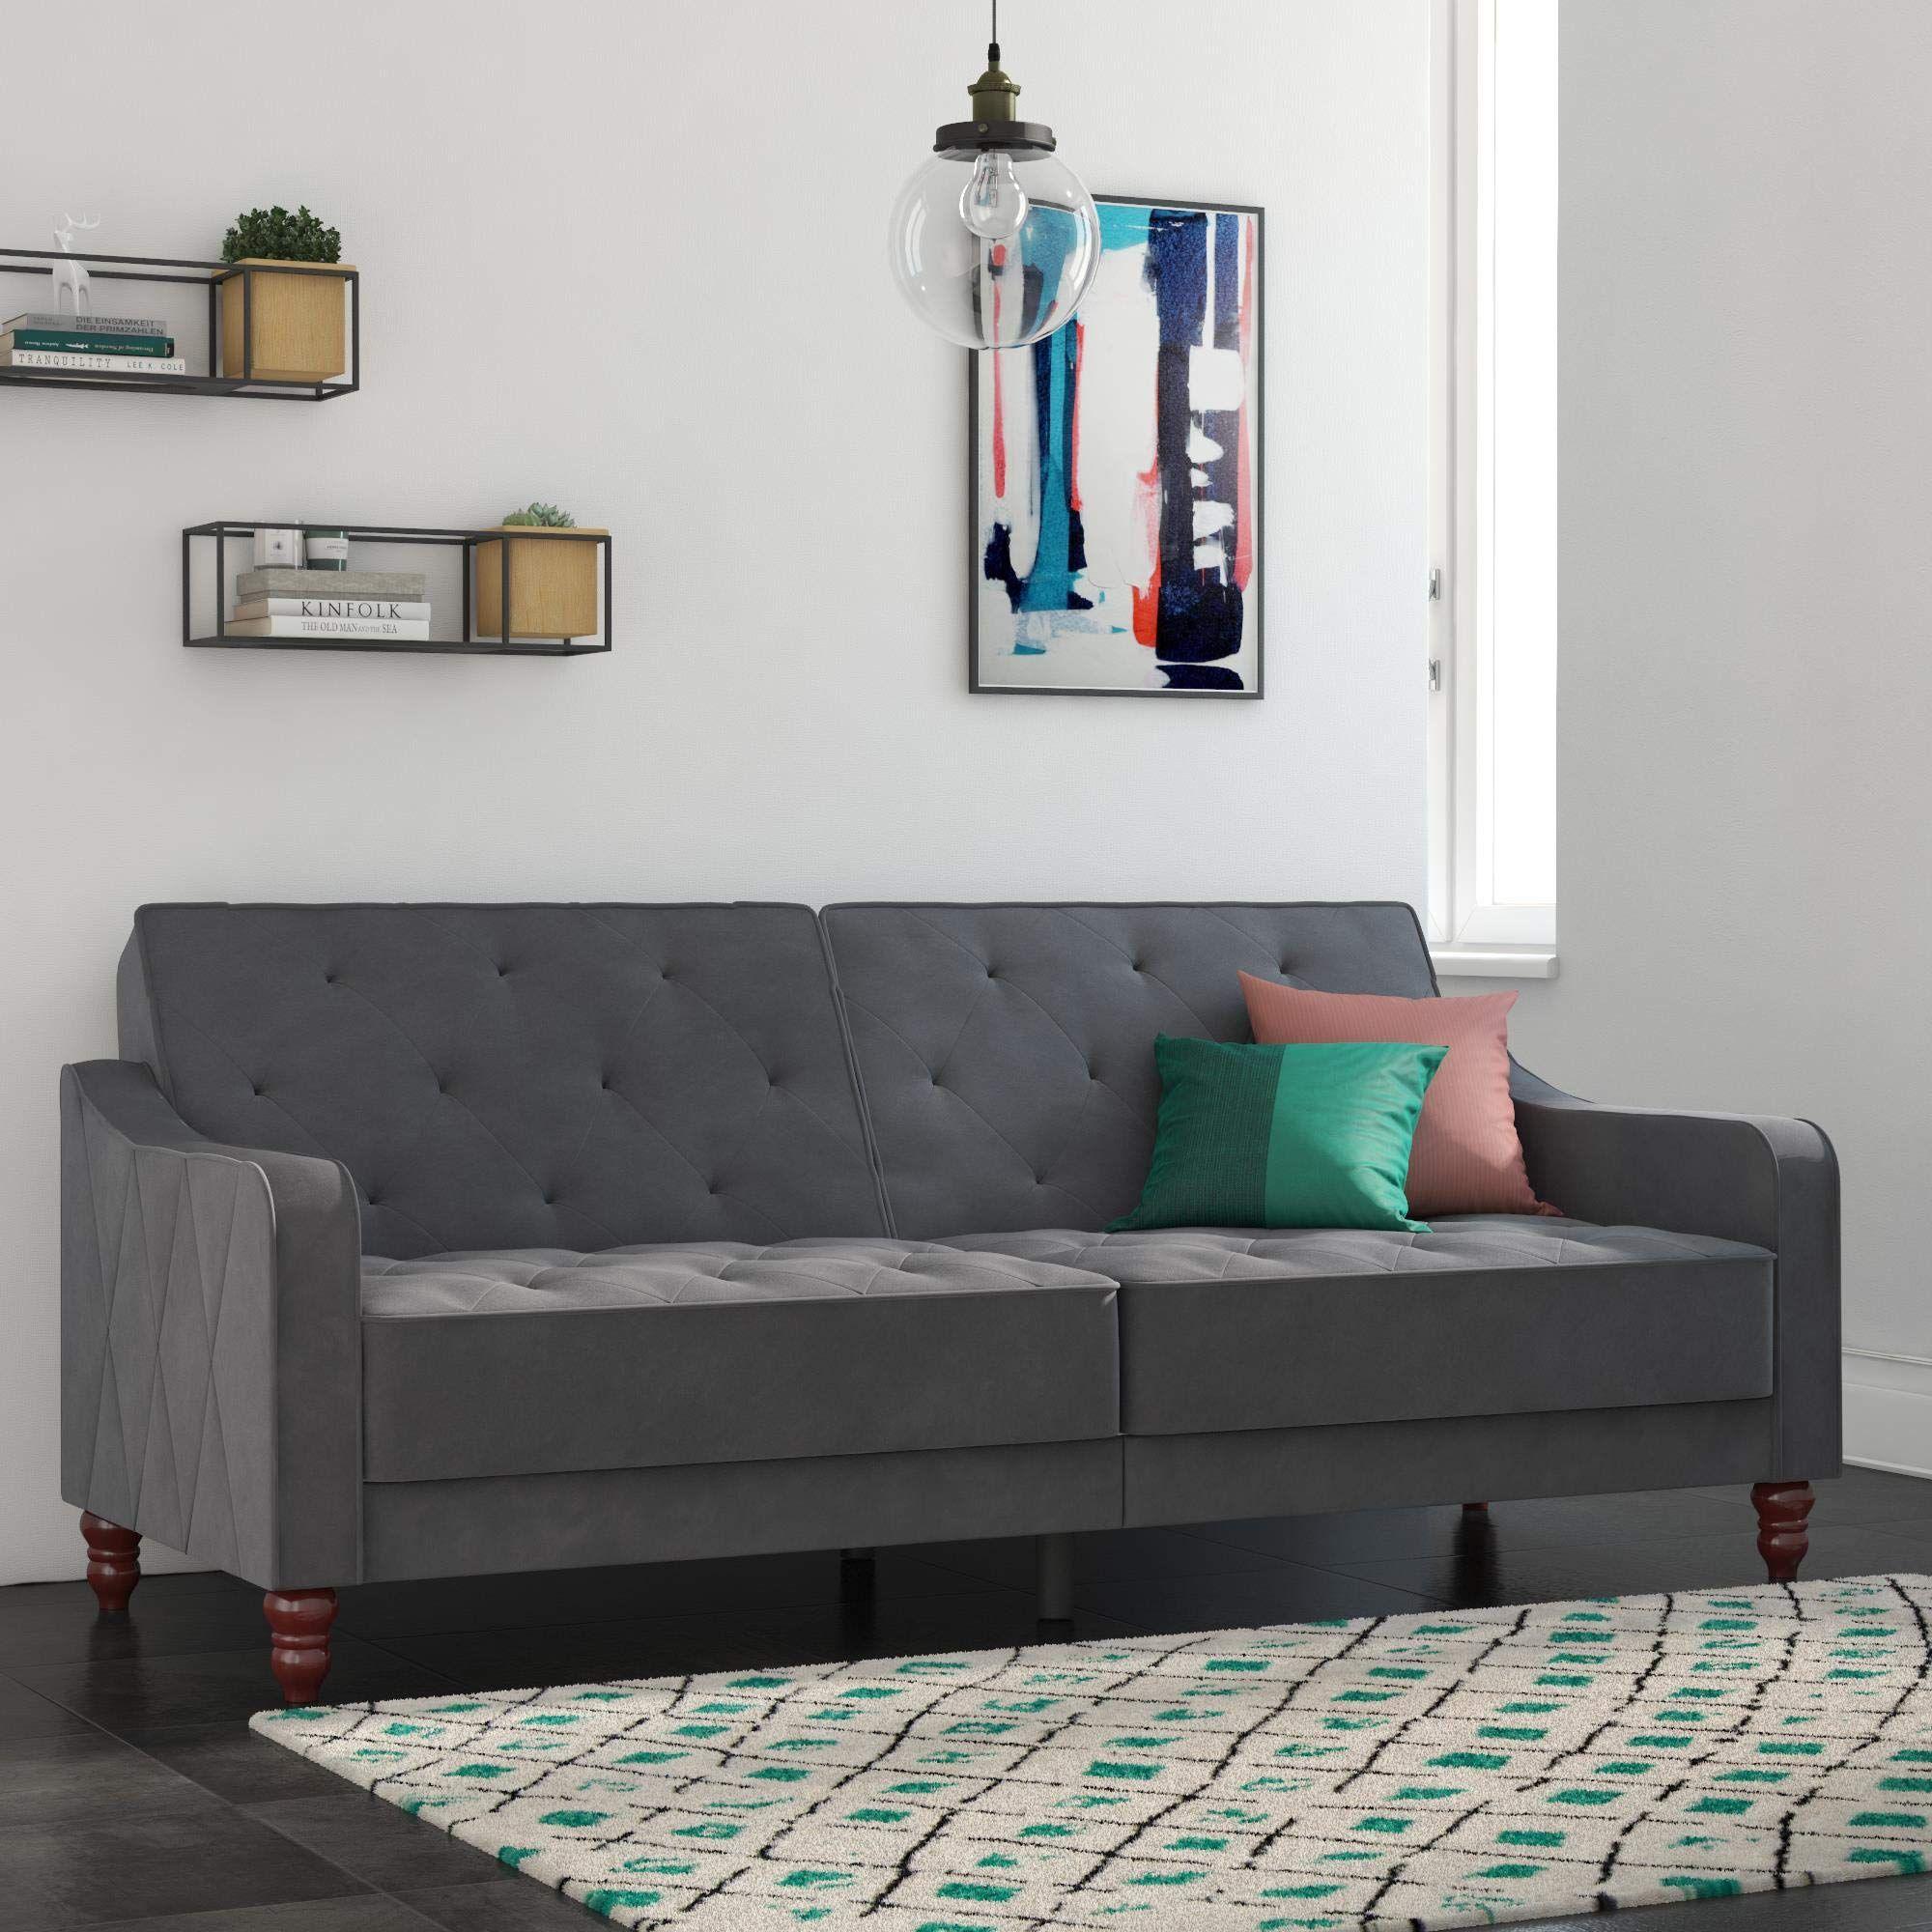 Stylish and Comfortable Sofa with Elegant Vintage Design ...